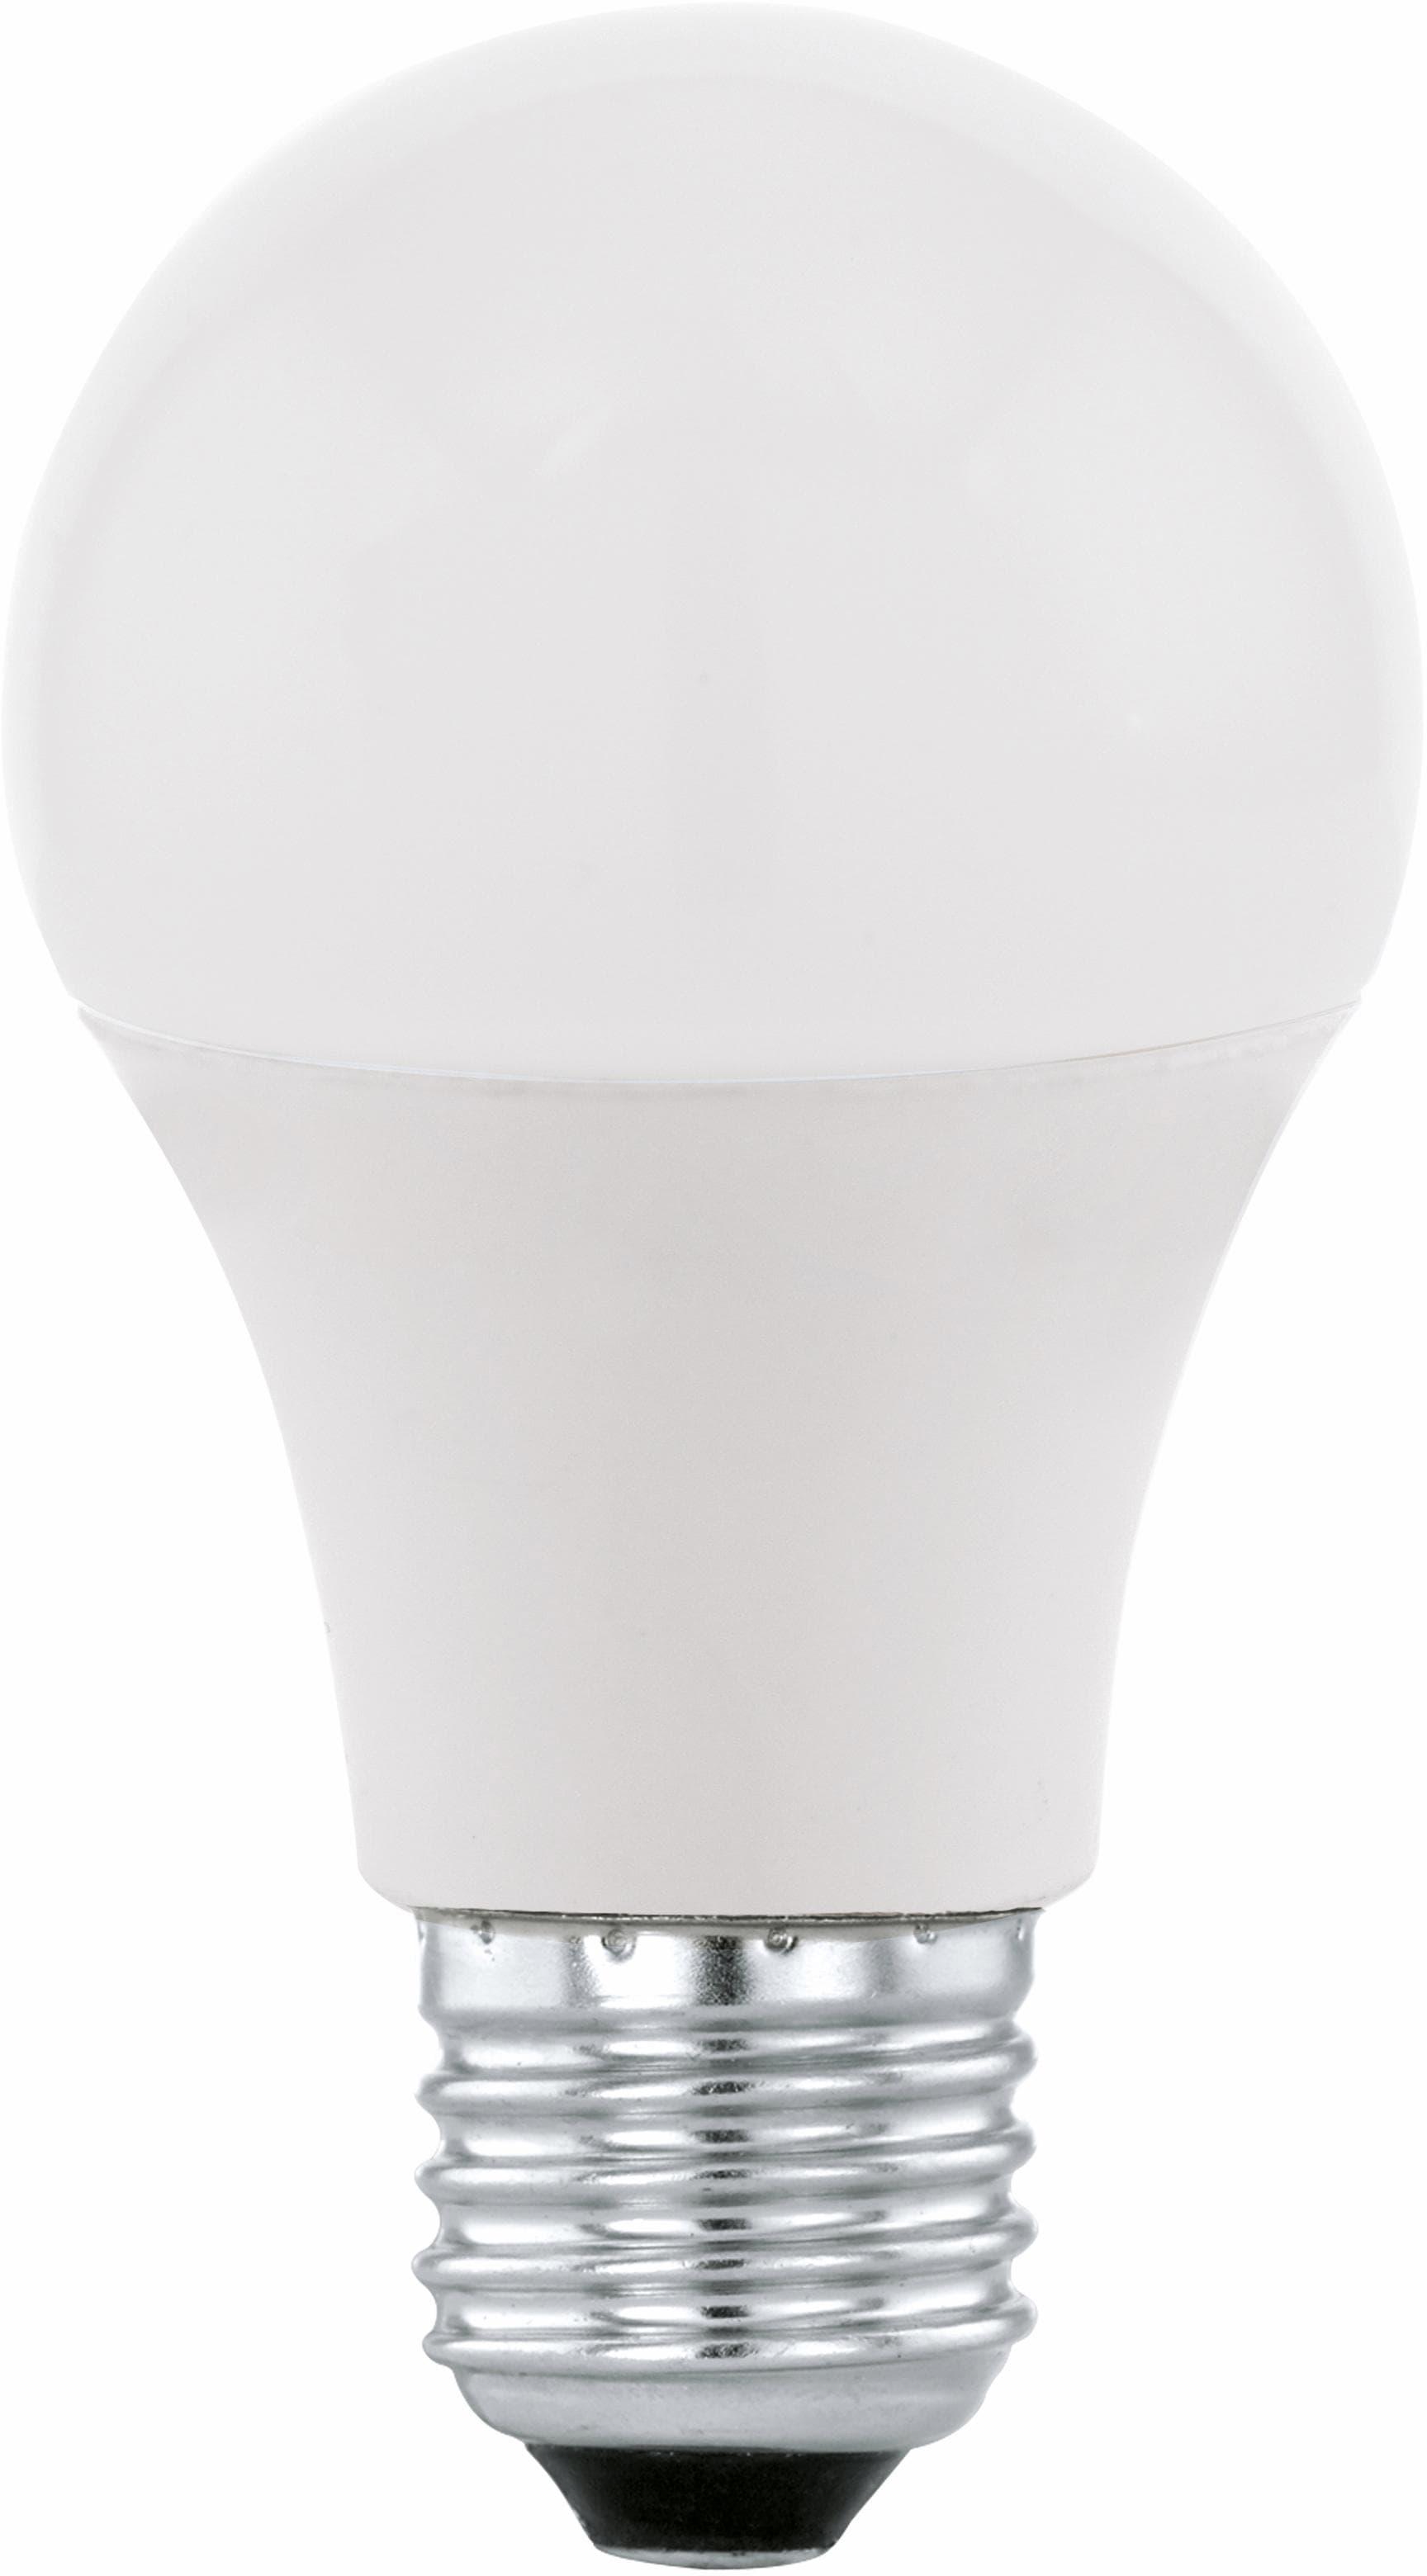 Eglo CONNECT, Leuchtmittel